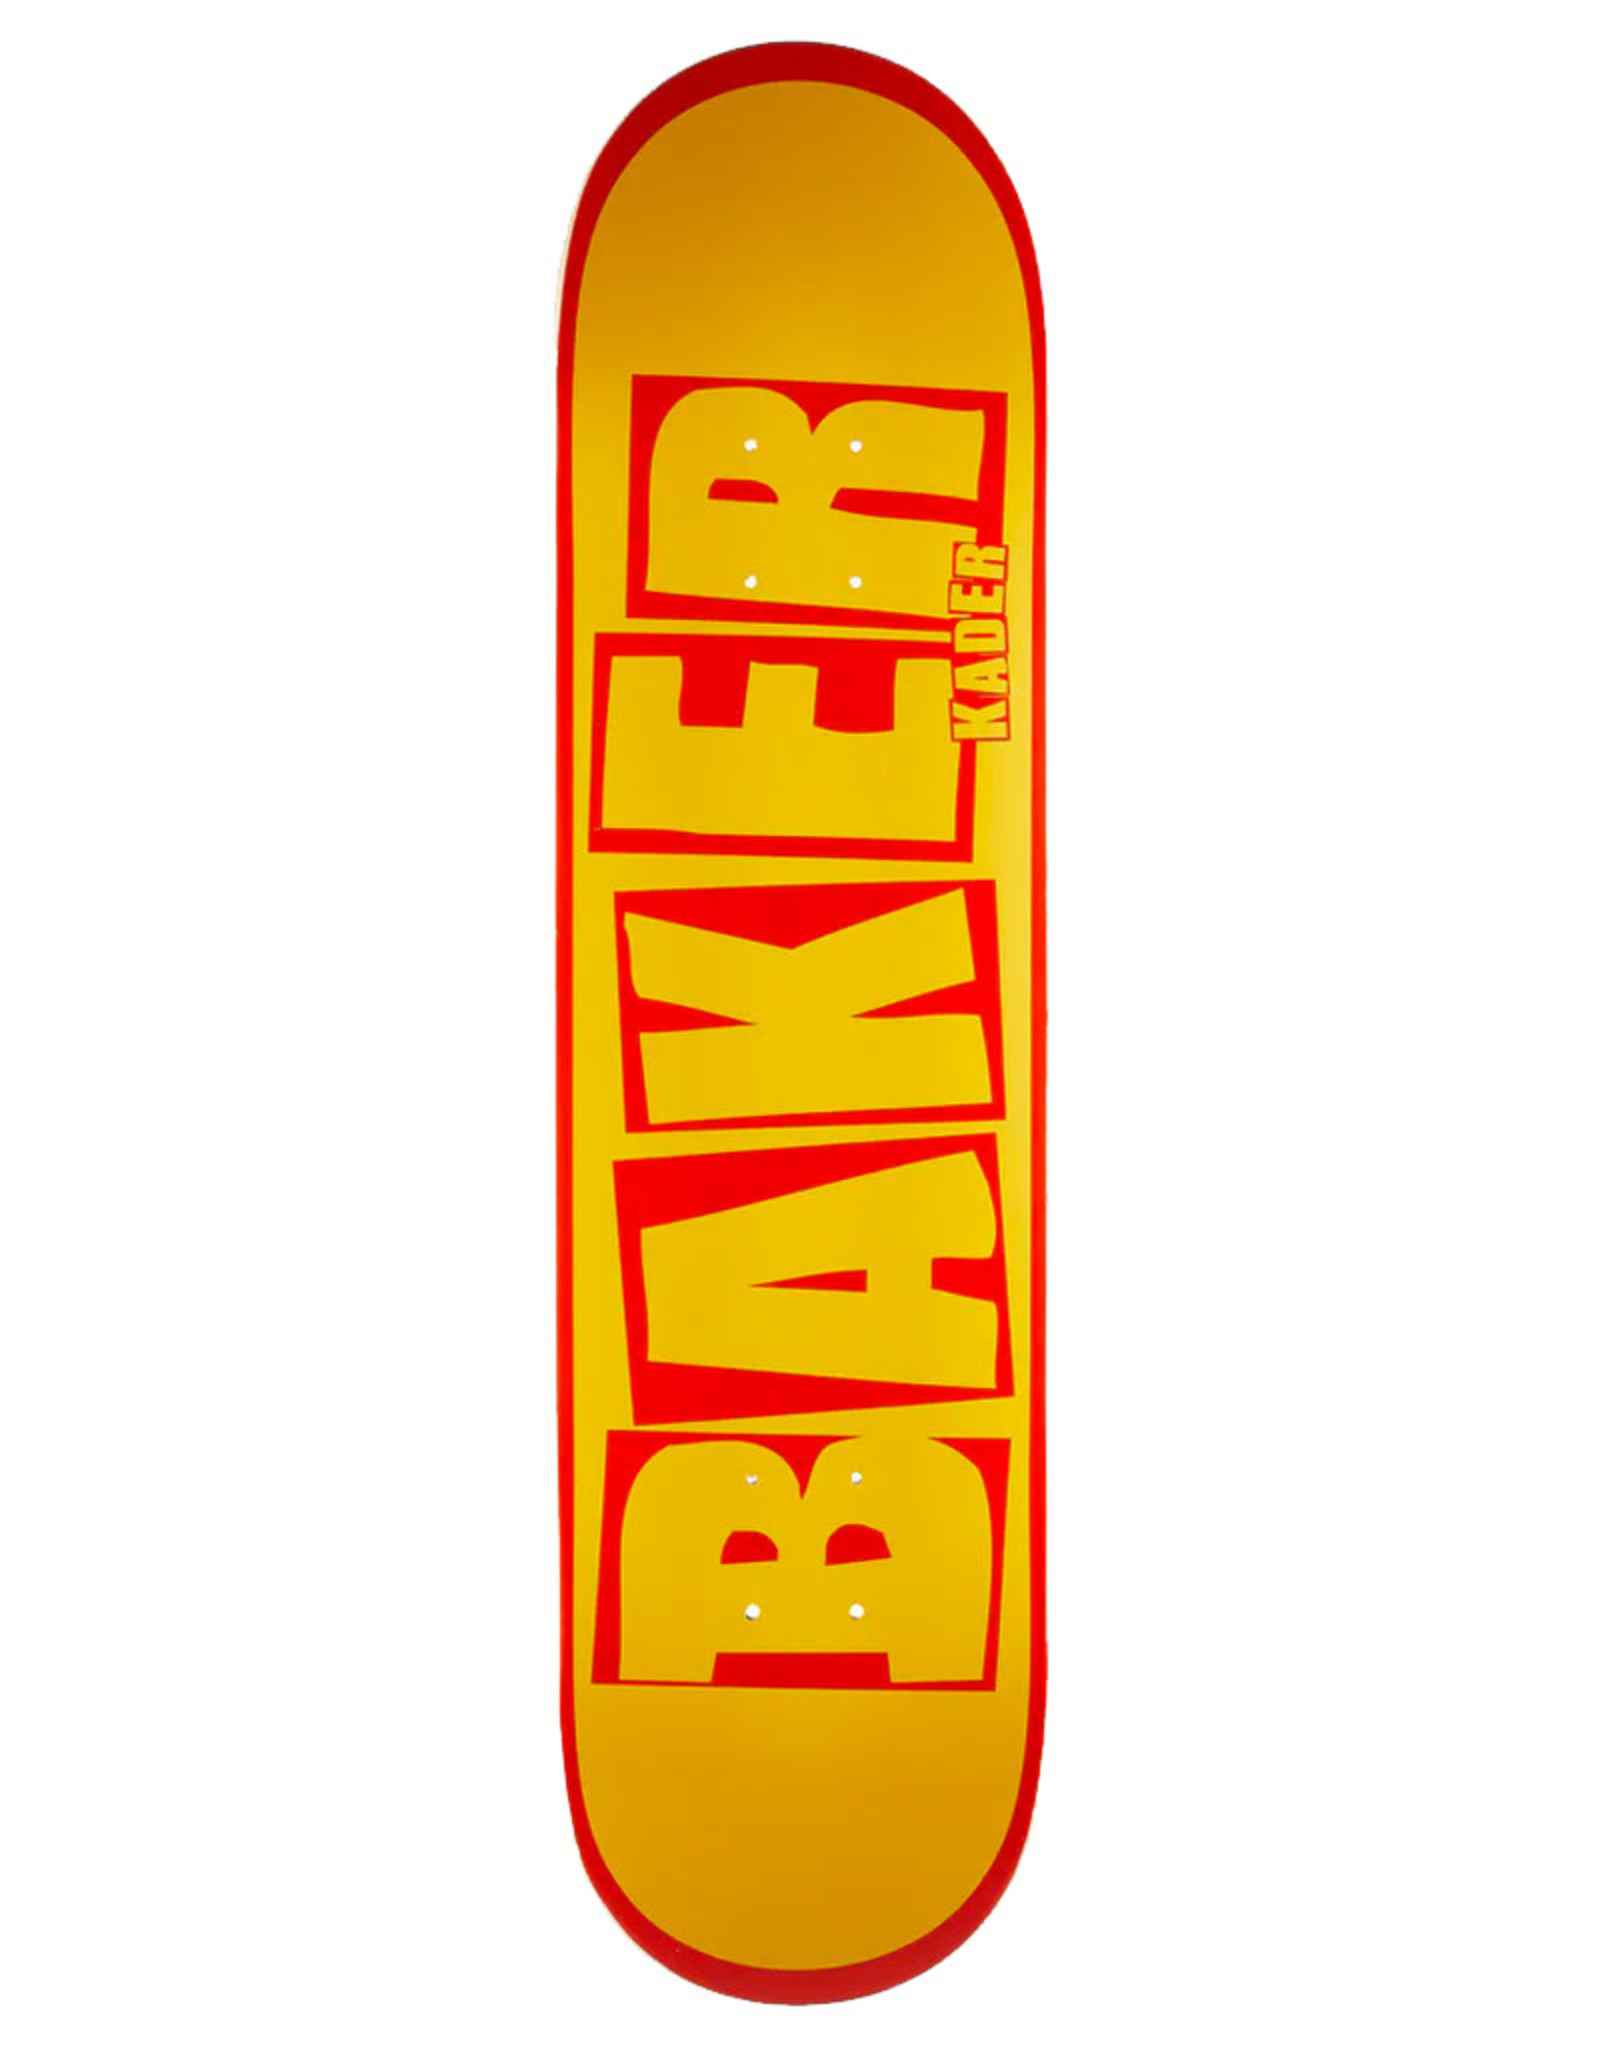 Baker Baker Deck Kader Sylla Brand Name Yellow/Red (7.875)